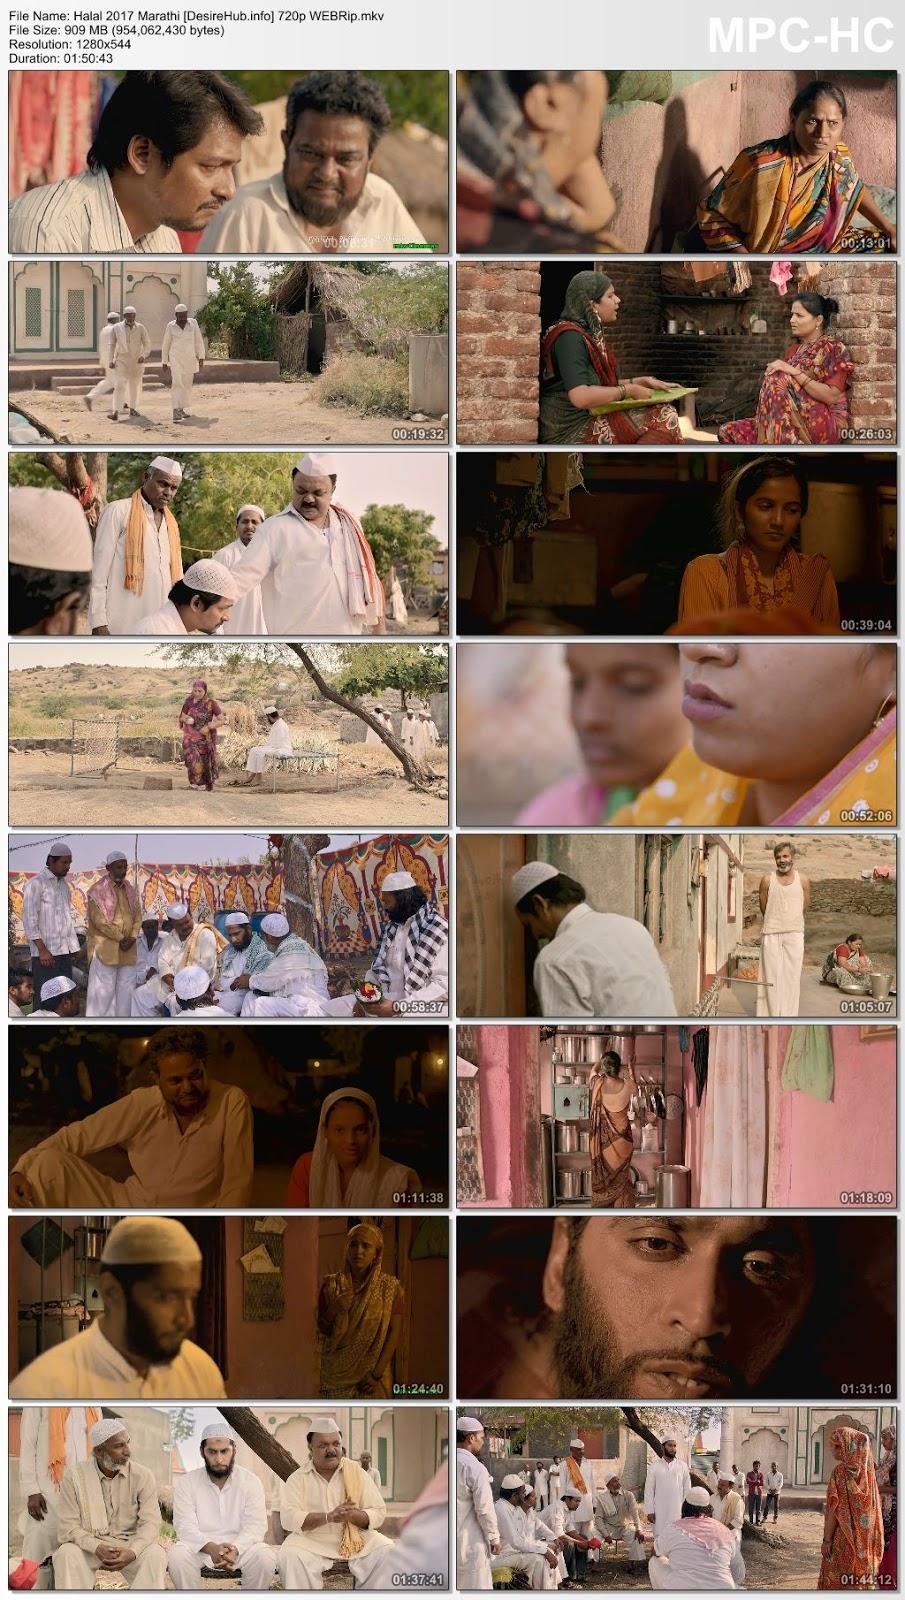 Halal 2017 Marathi 480p WEBRip 300MB Desirehub